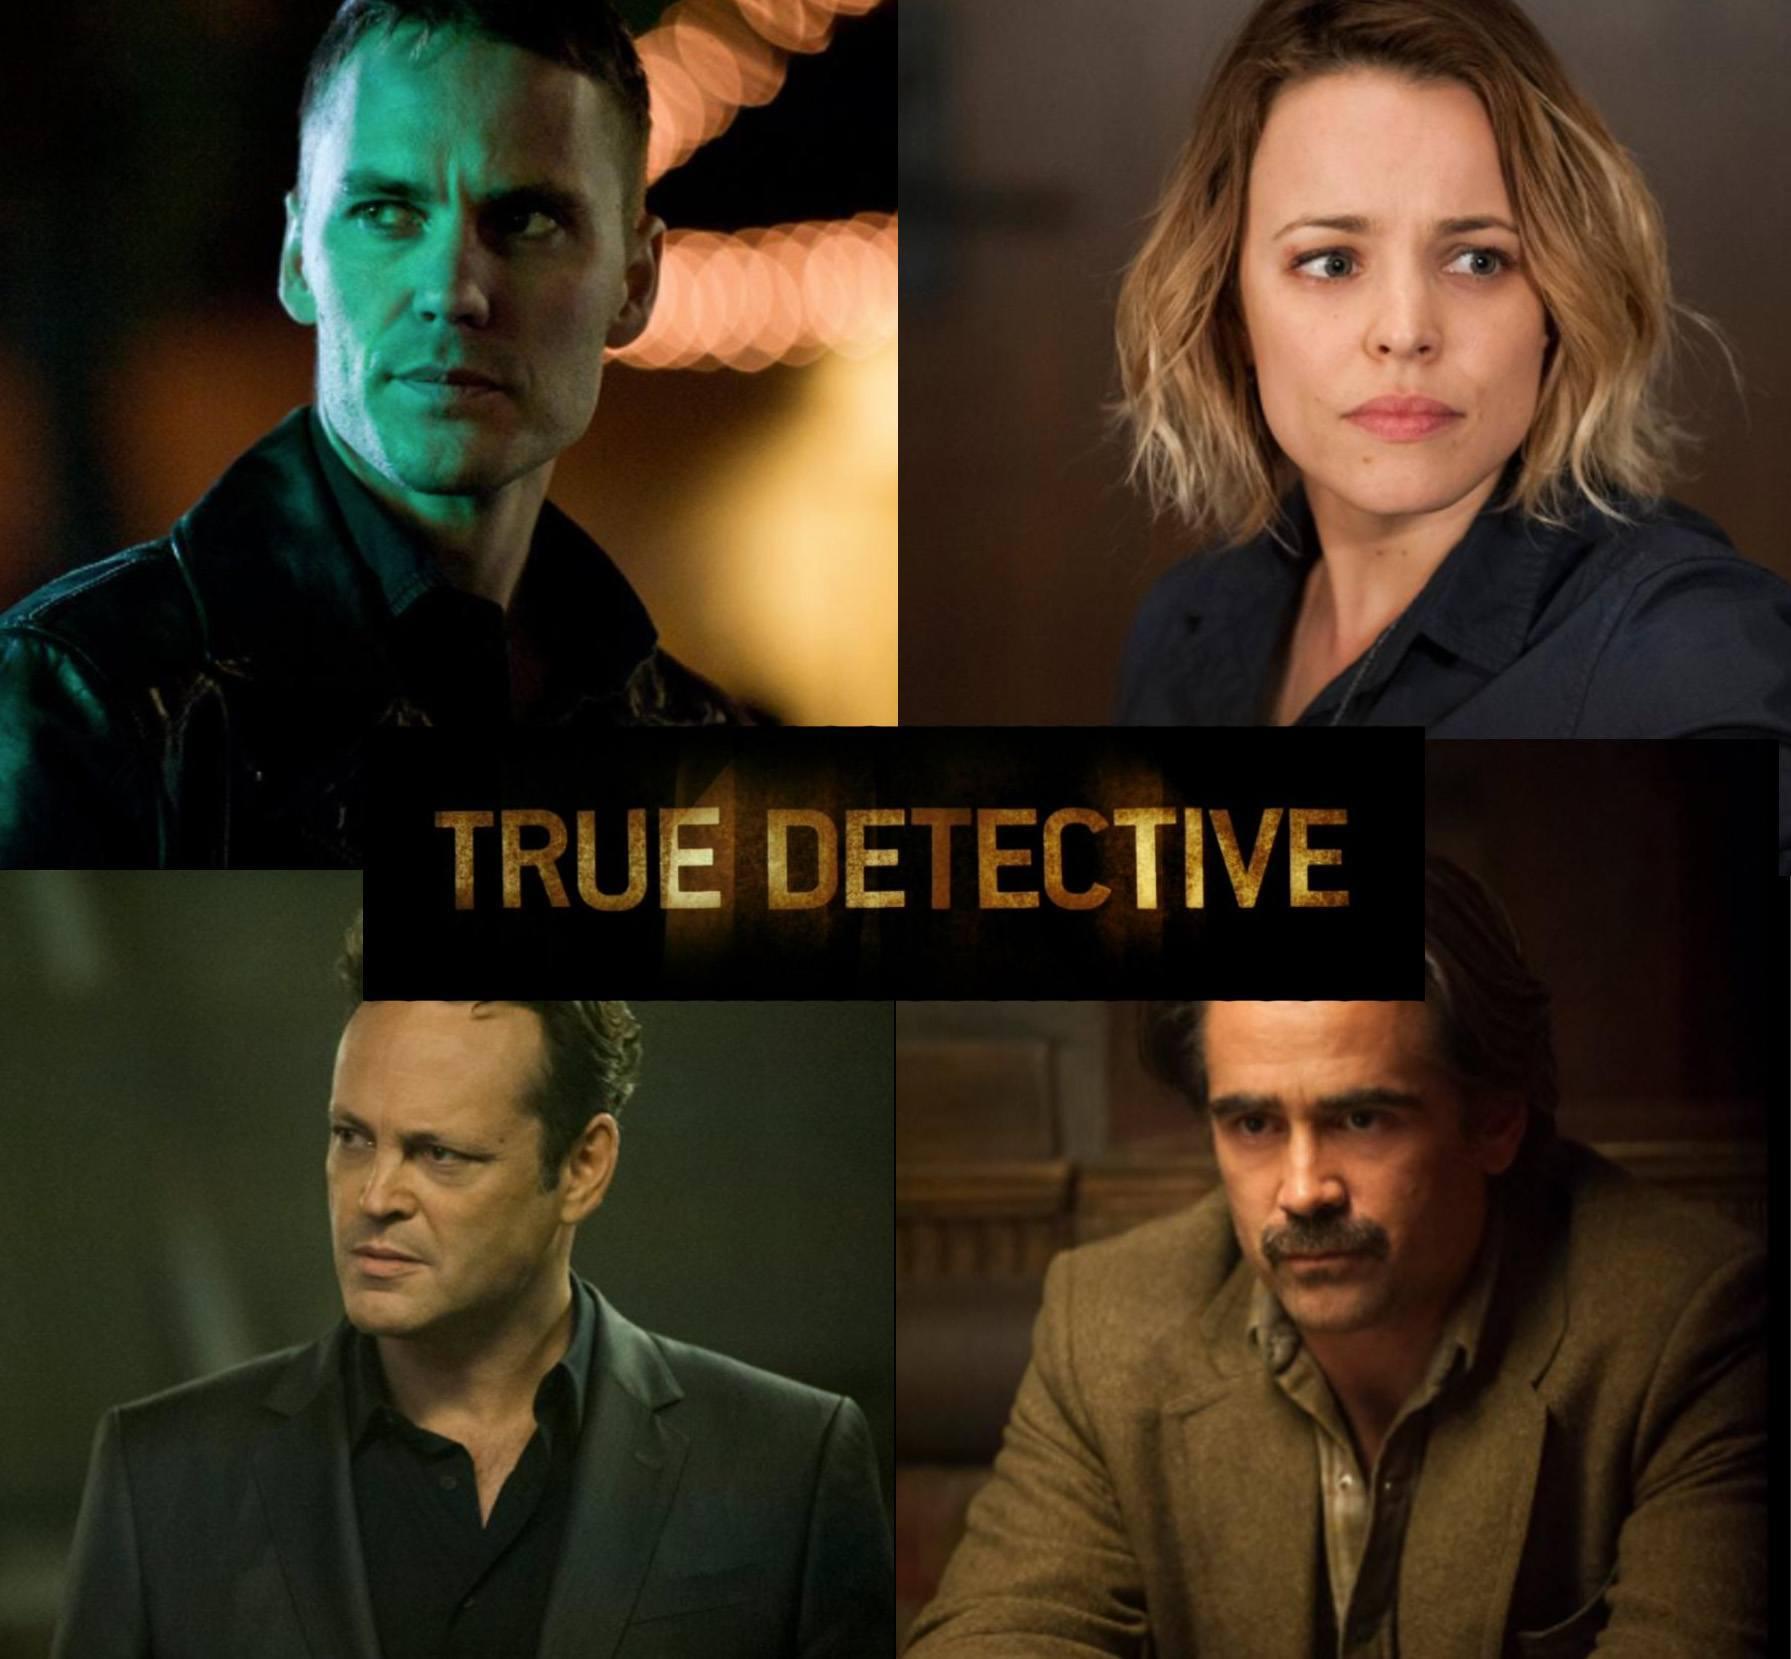 True detective homix season i